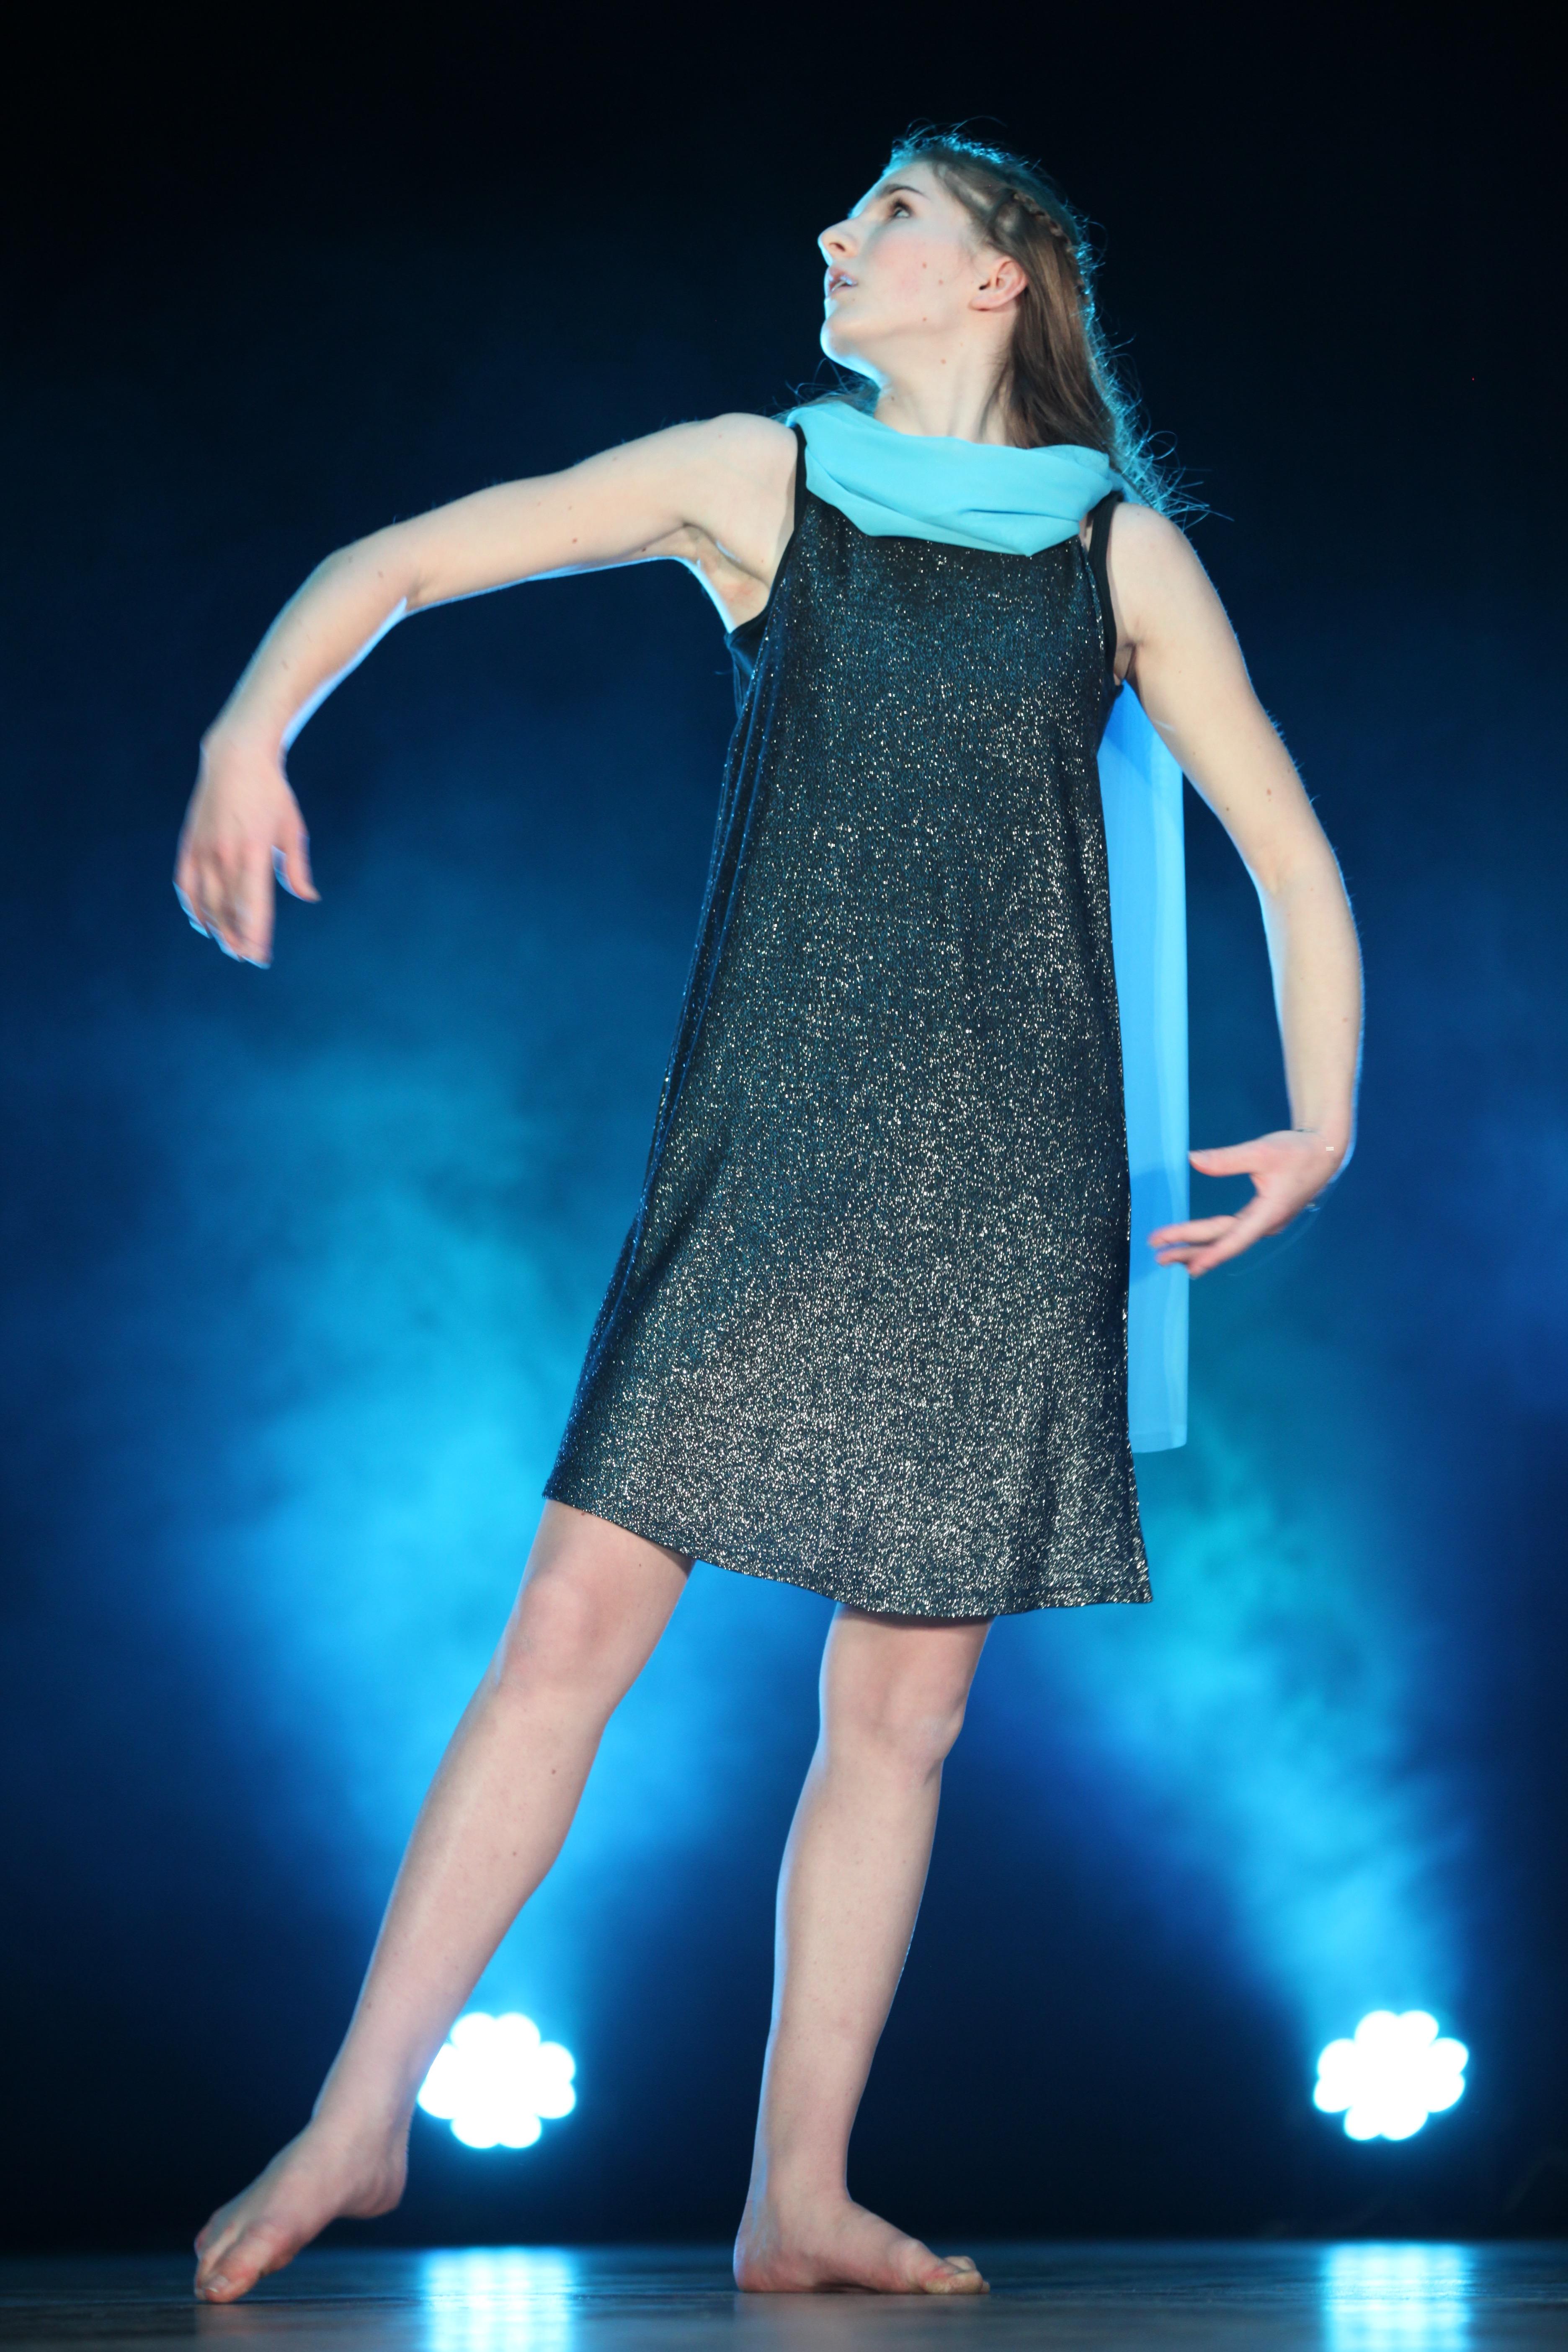 BLUE DANCING